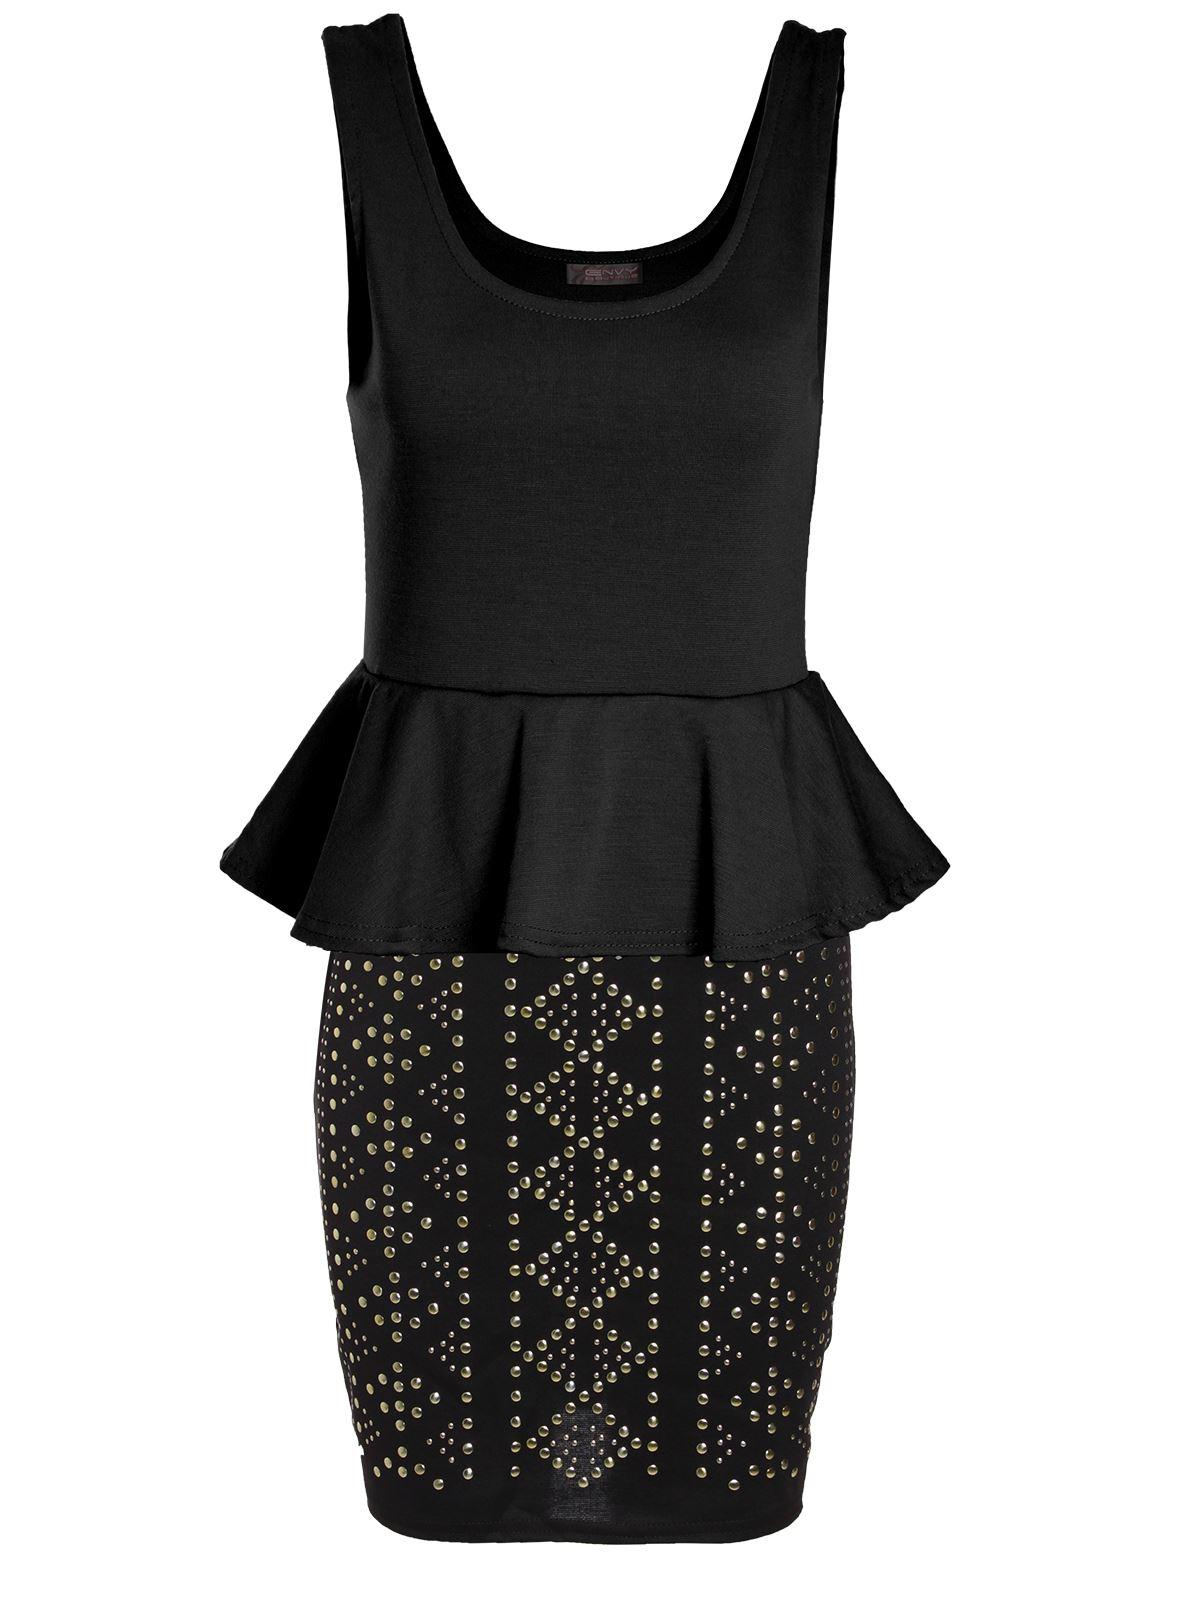 ladies womens peplum sleeveless top bodycon skirt studded